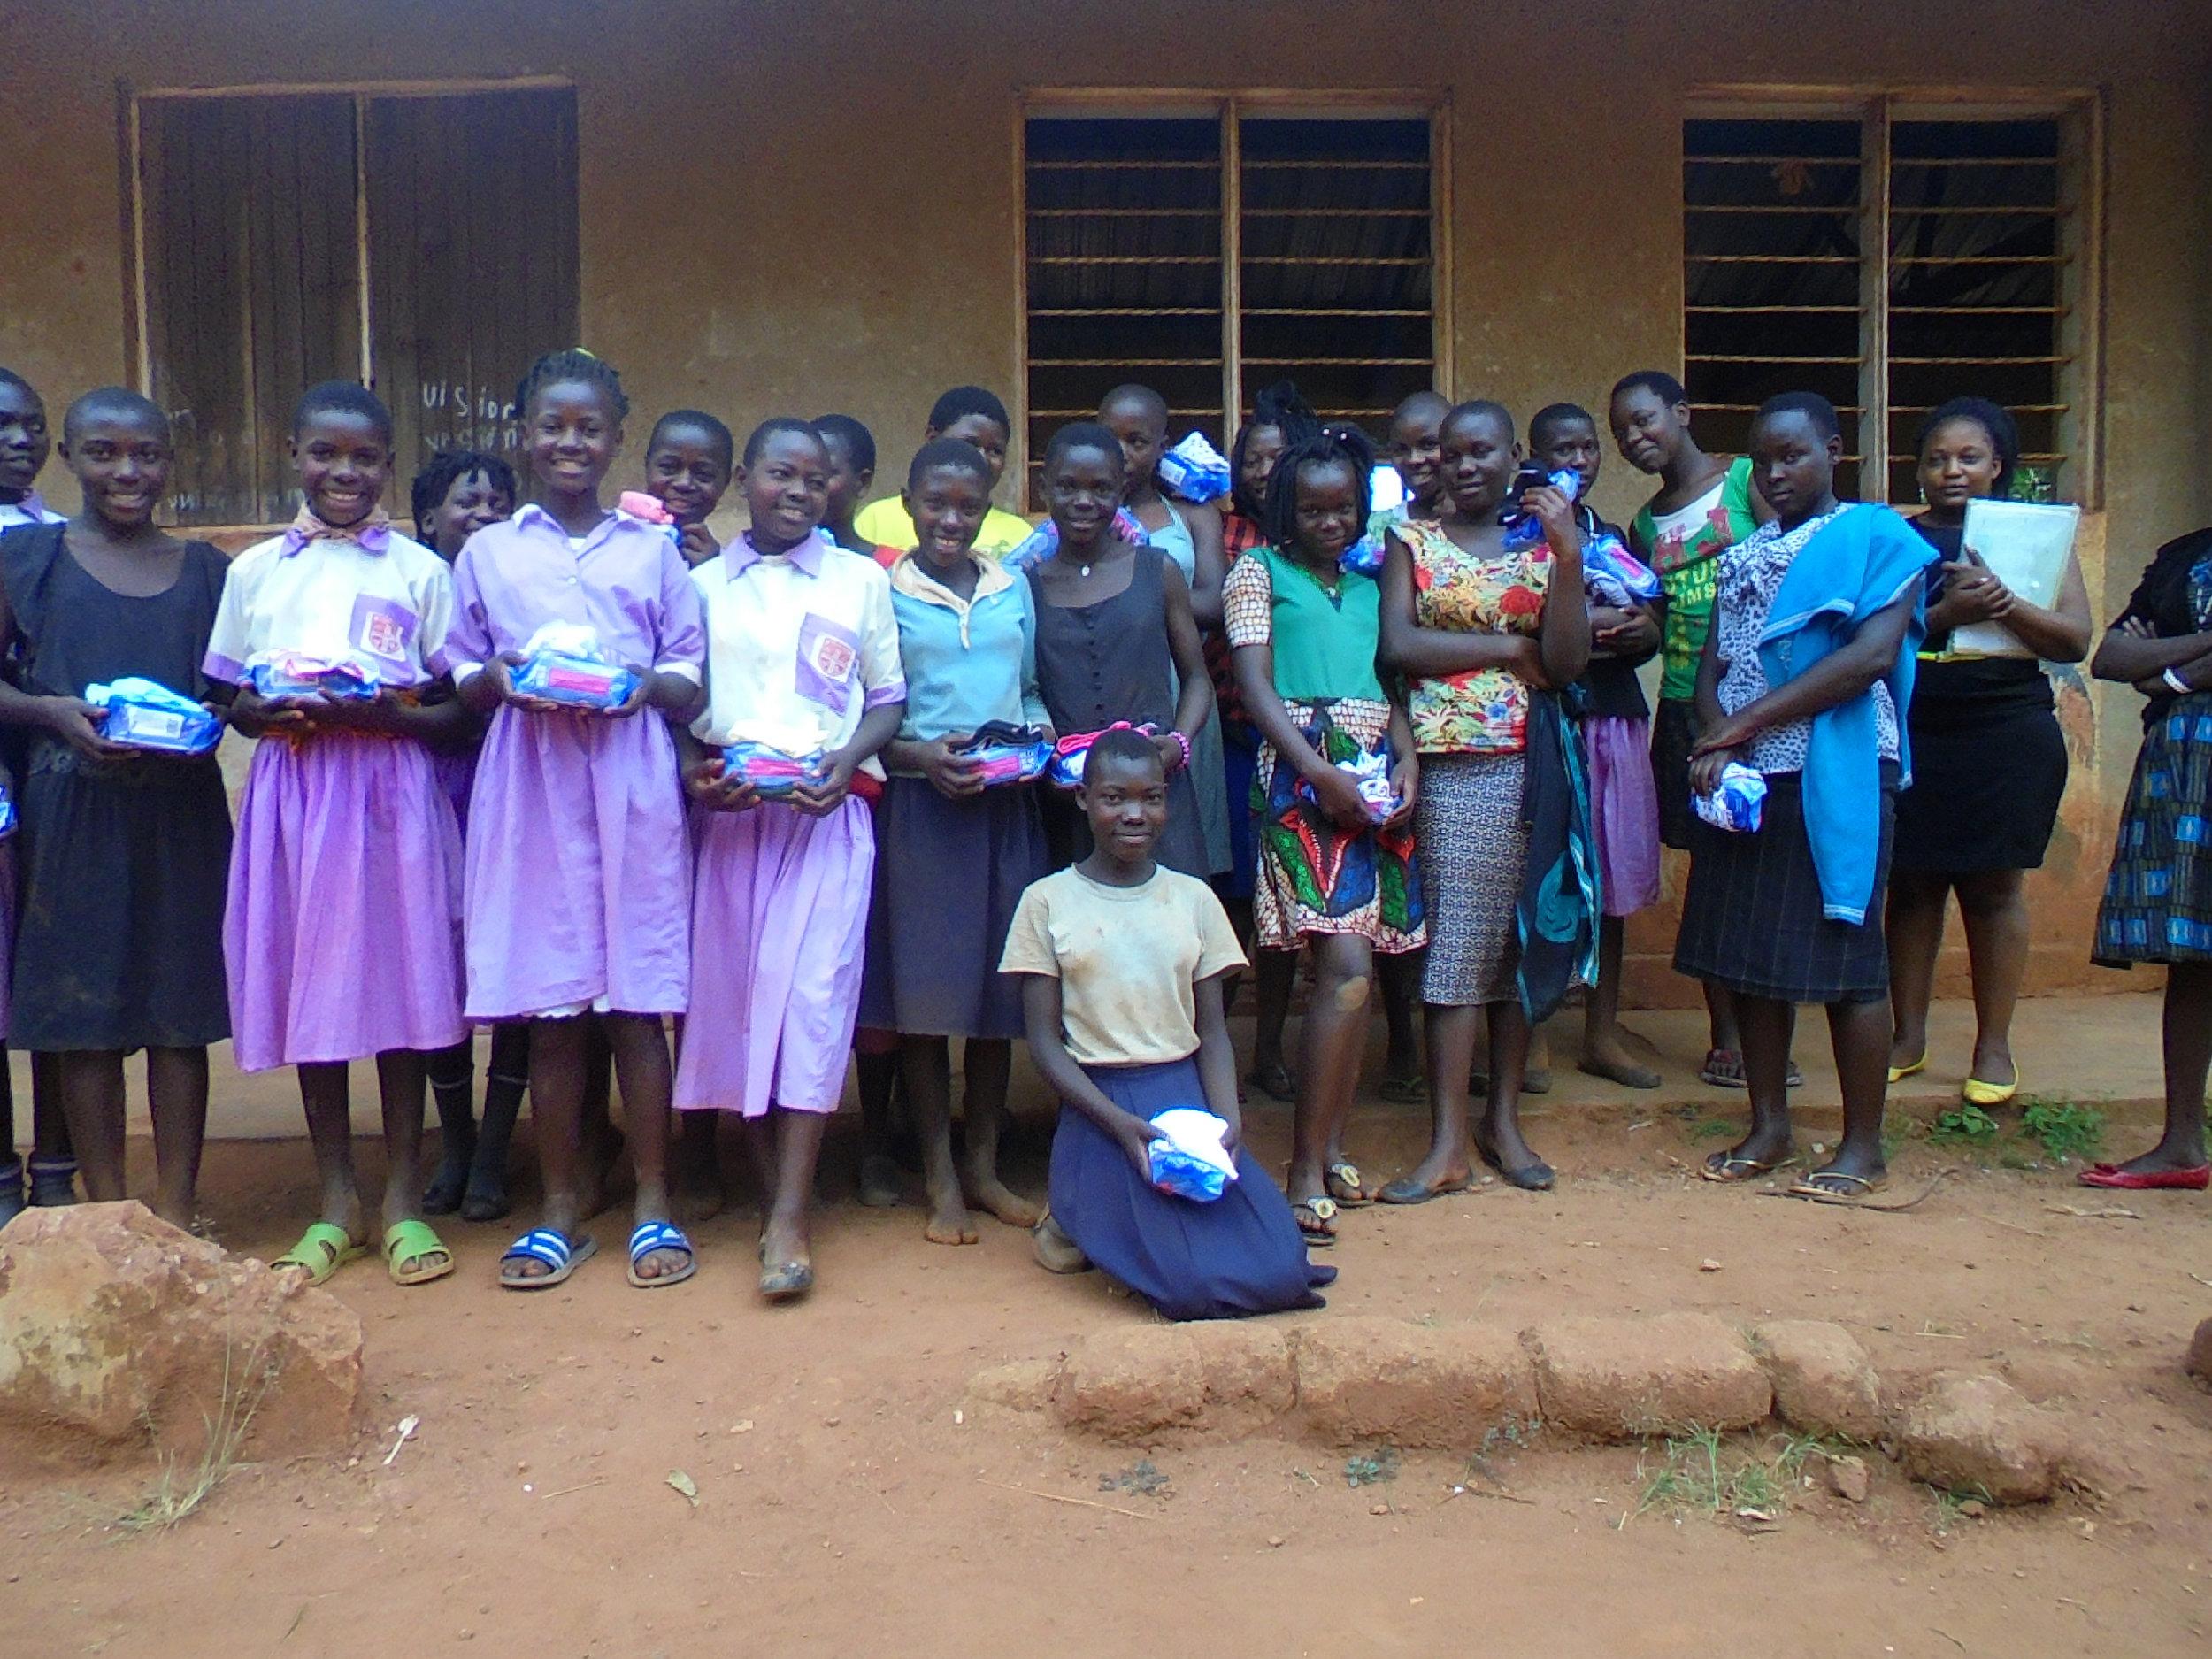 Munkabira Primary School